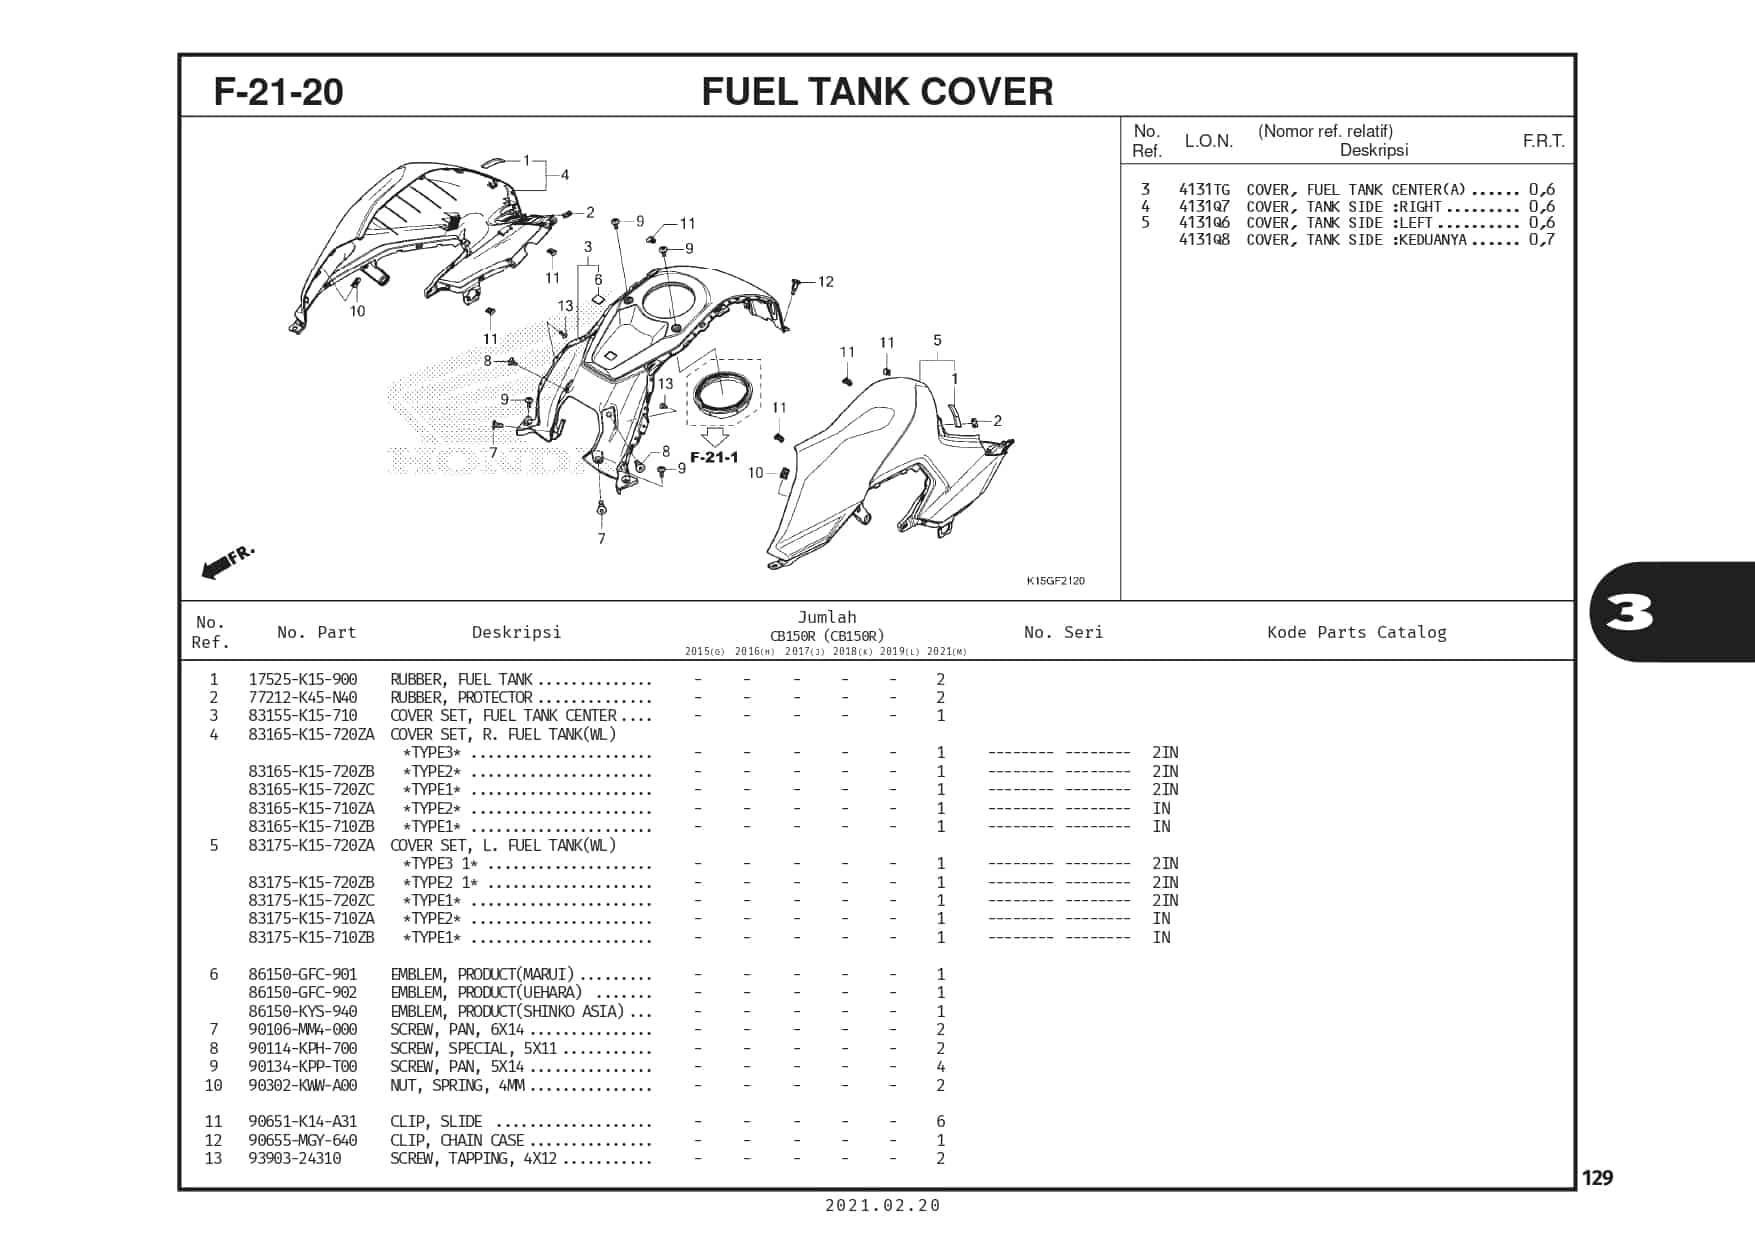 F-21-20 Fuel Tank Cover